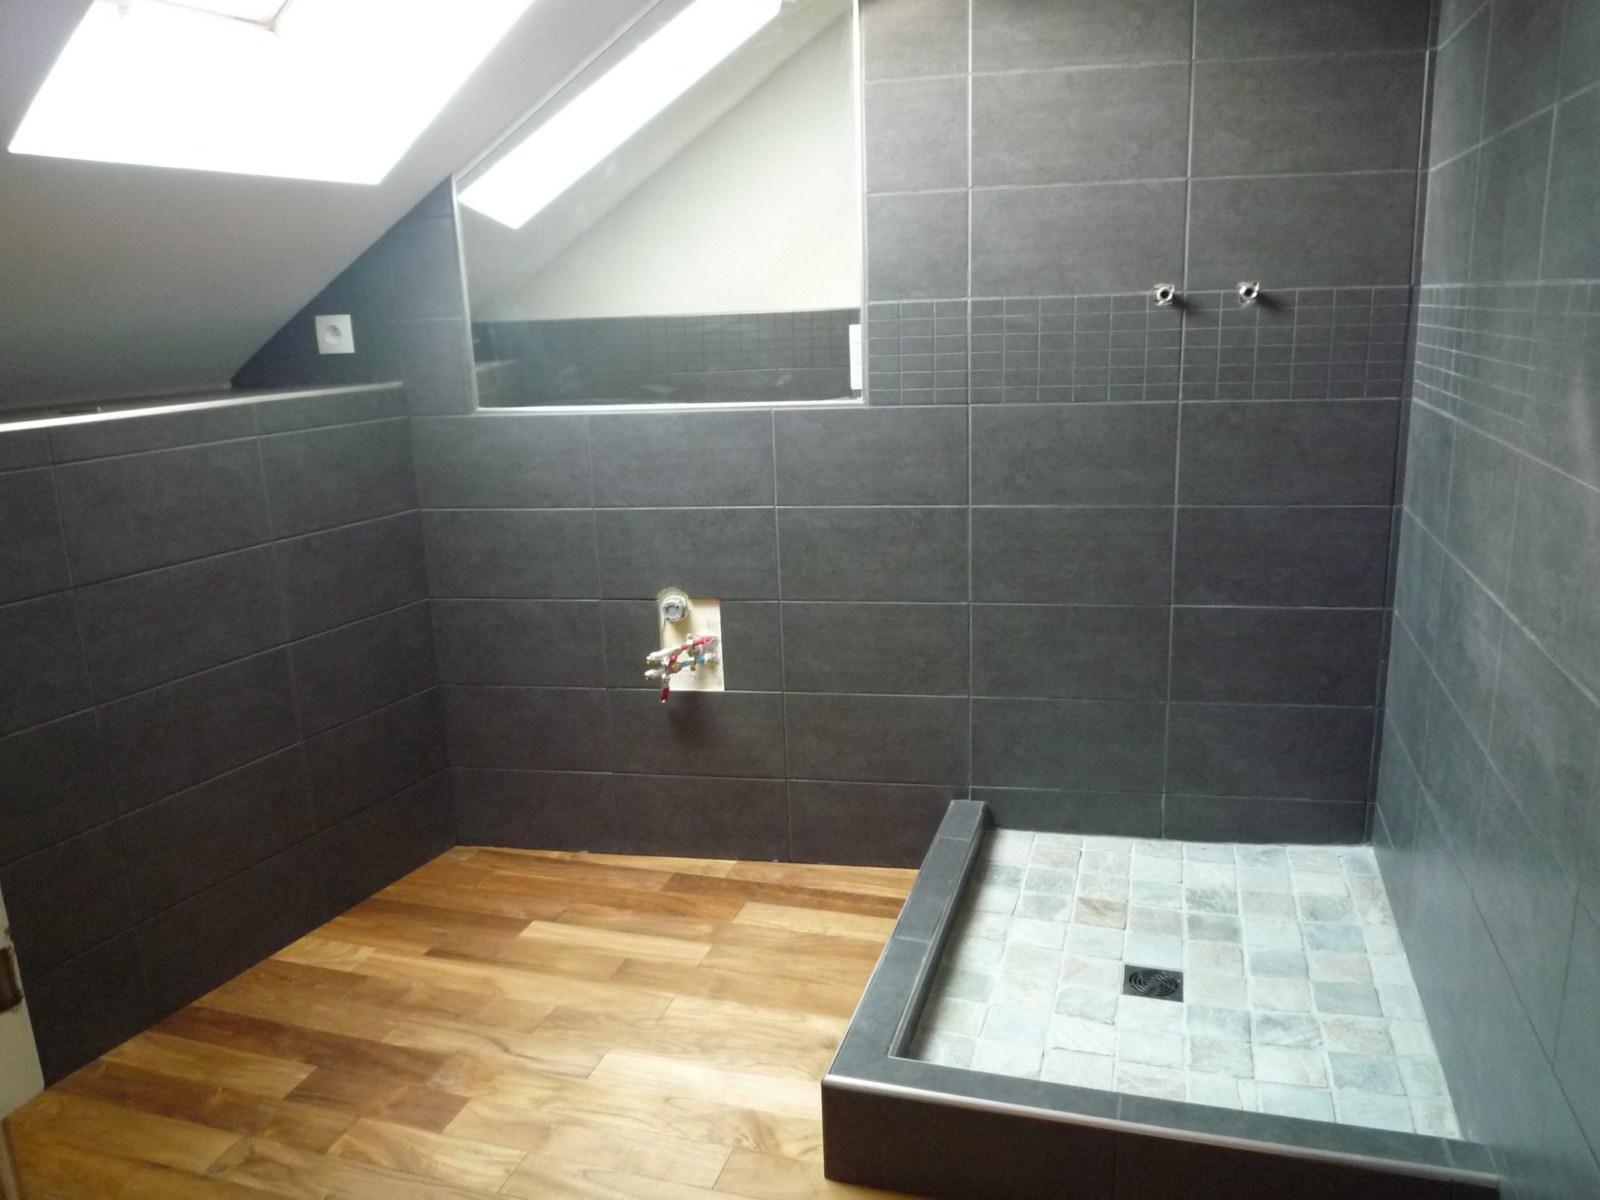 Salle de bain teck et ardoise xz23 jornalagora - Salle de bain en ardoise ...